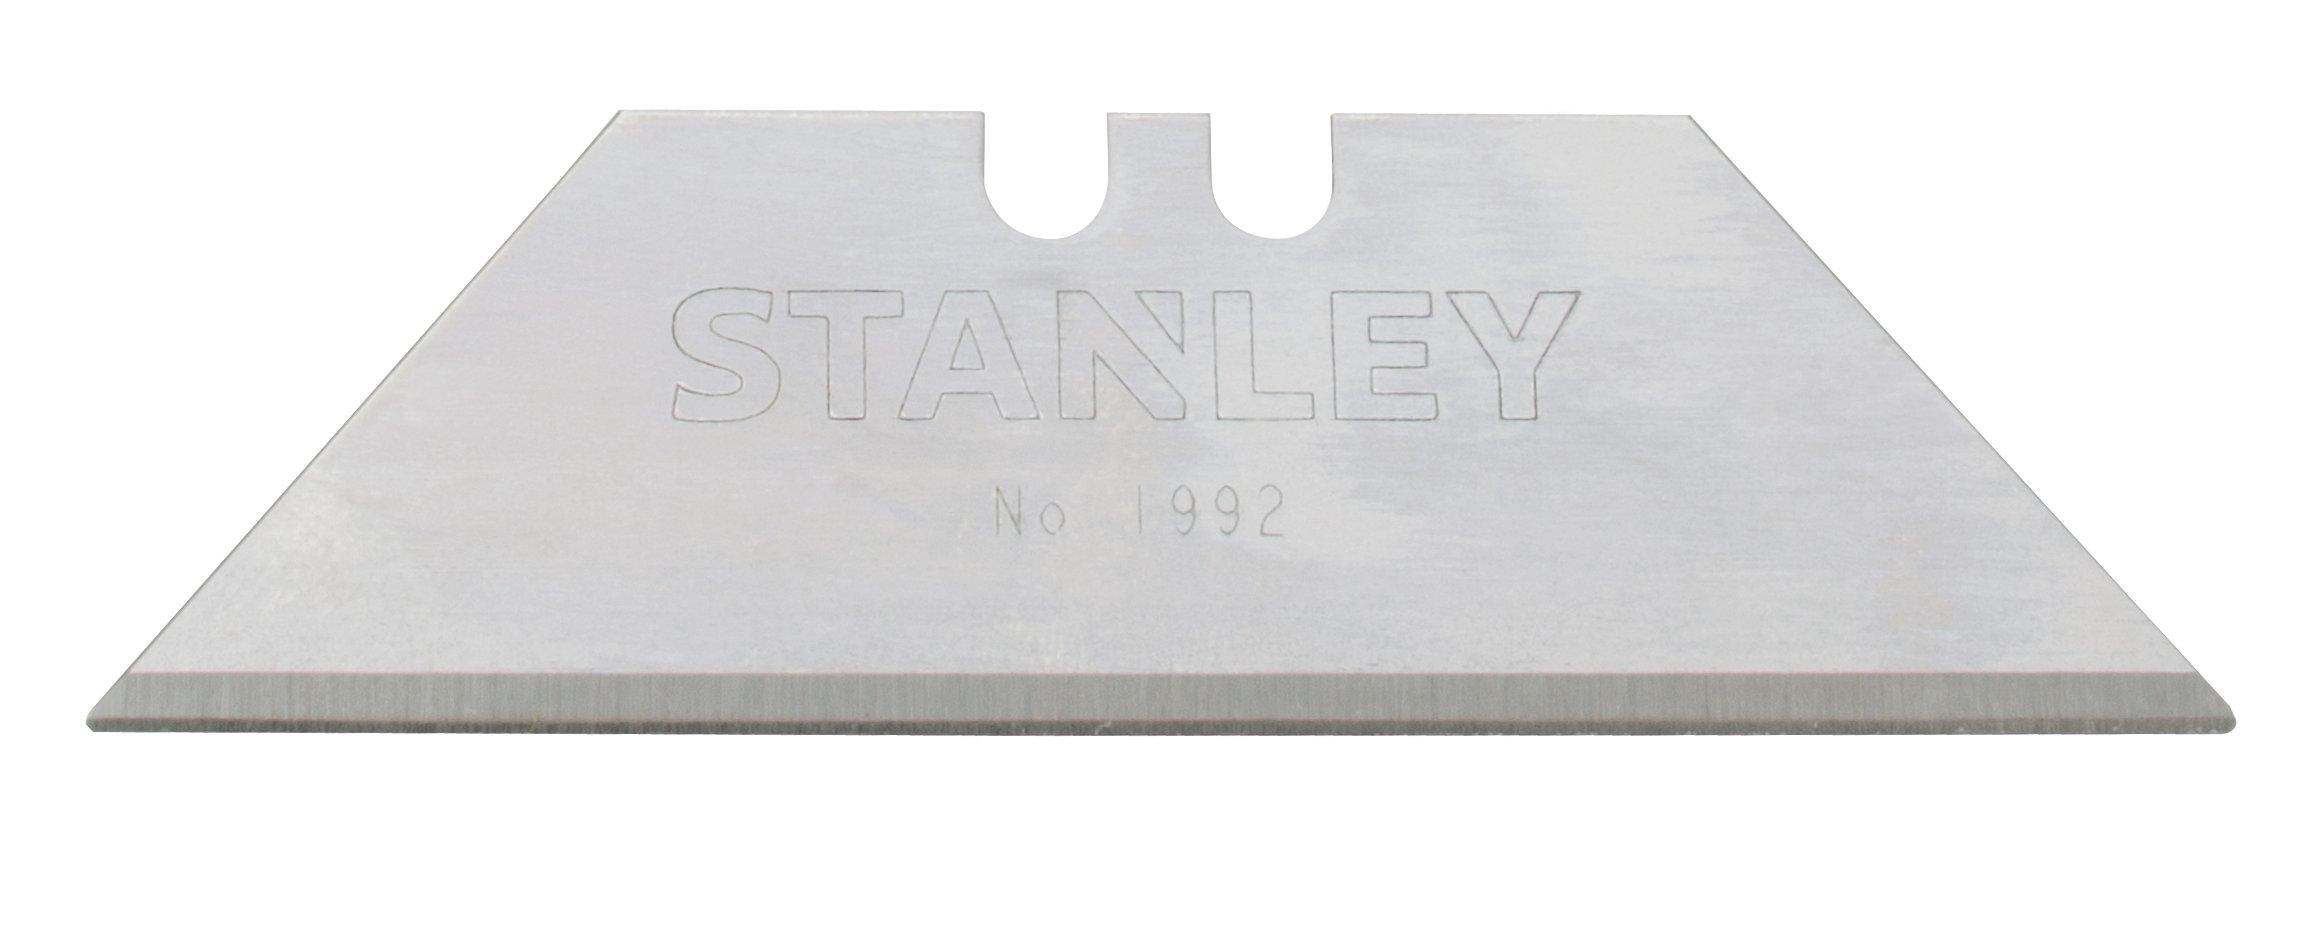 Stanley 11-921B 400-Pack 1992 Heavy Duty Utility Blades